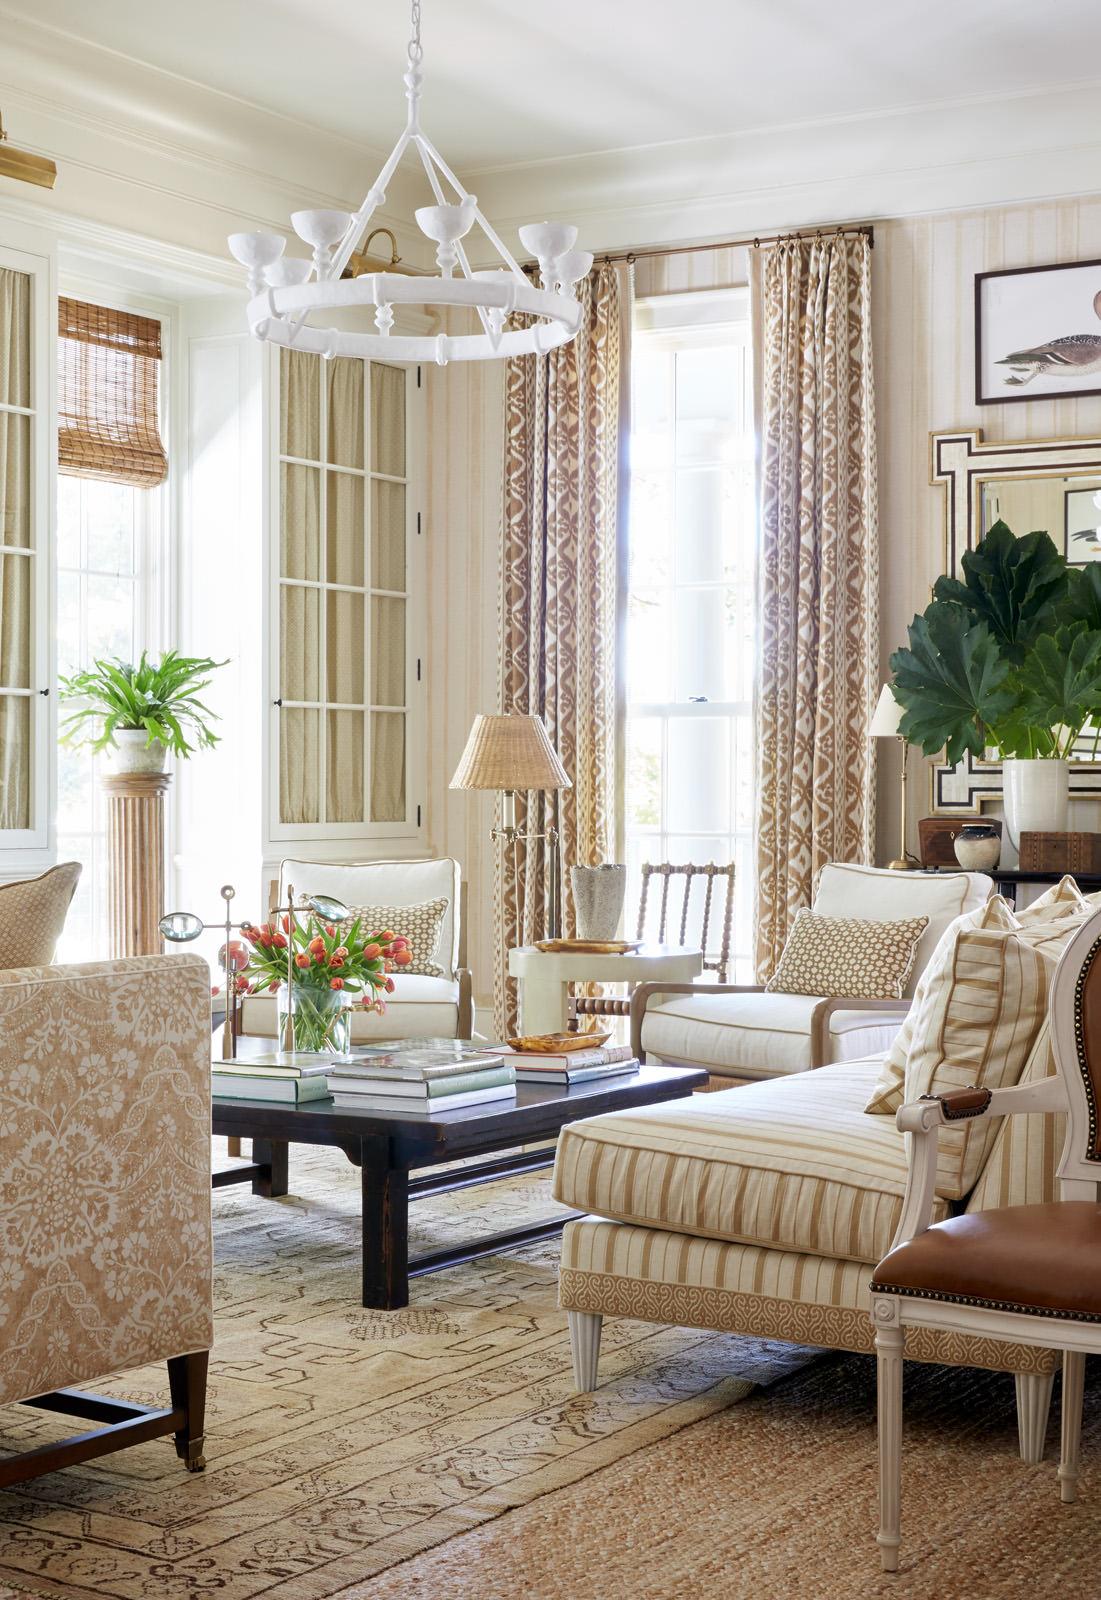 Color outside the lines inspiration vs copycatting - Living room vs family room ...